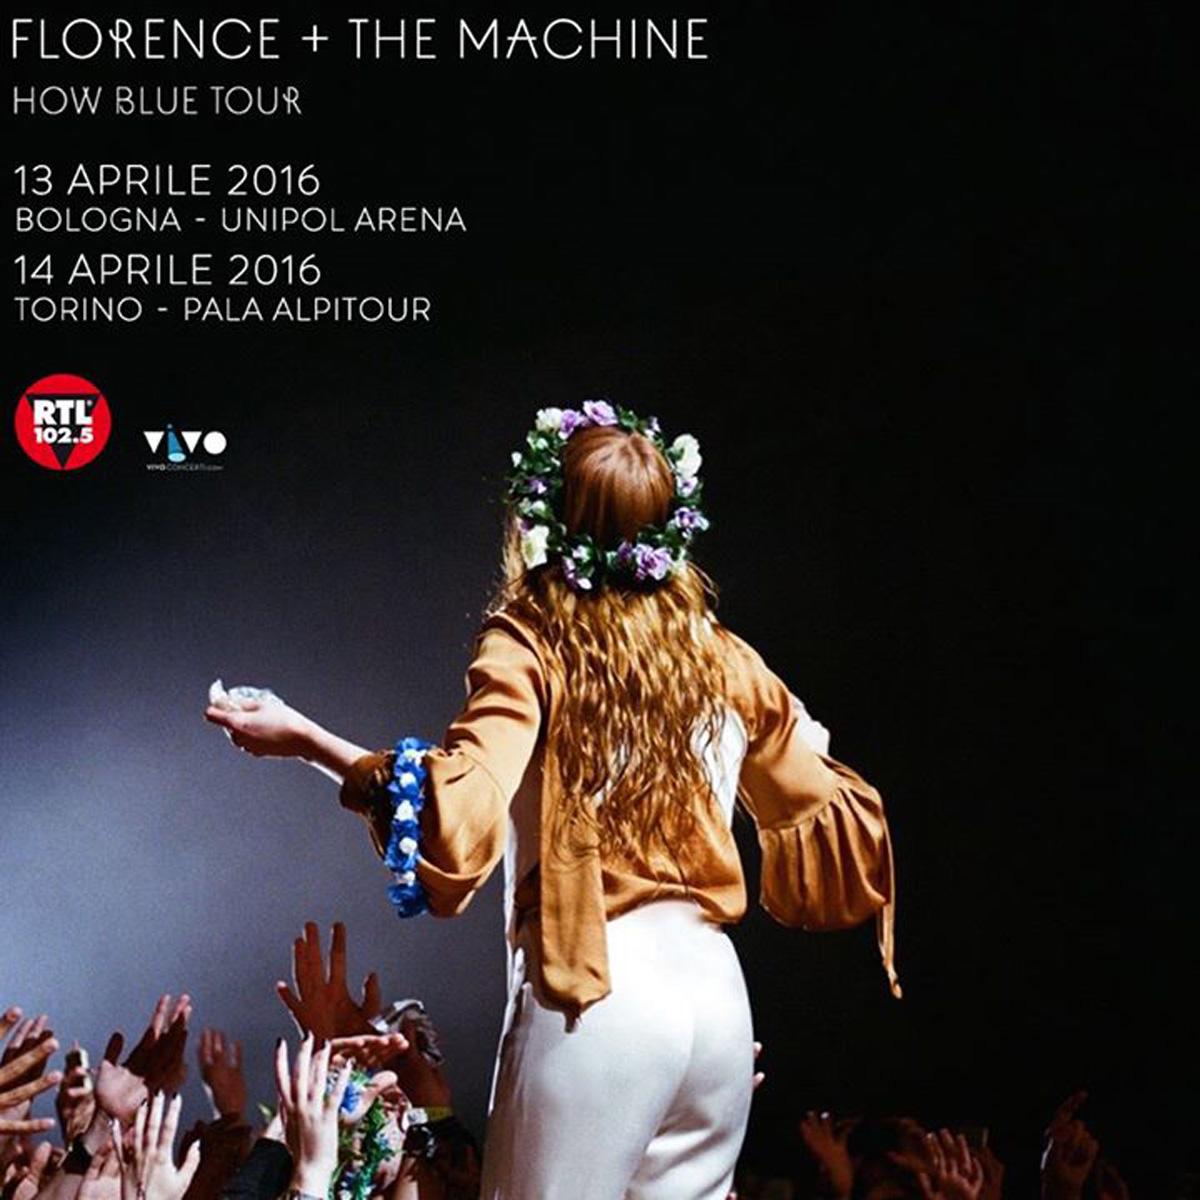 florence and the machine pandora presale